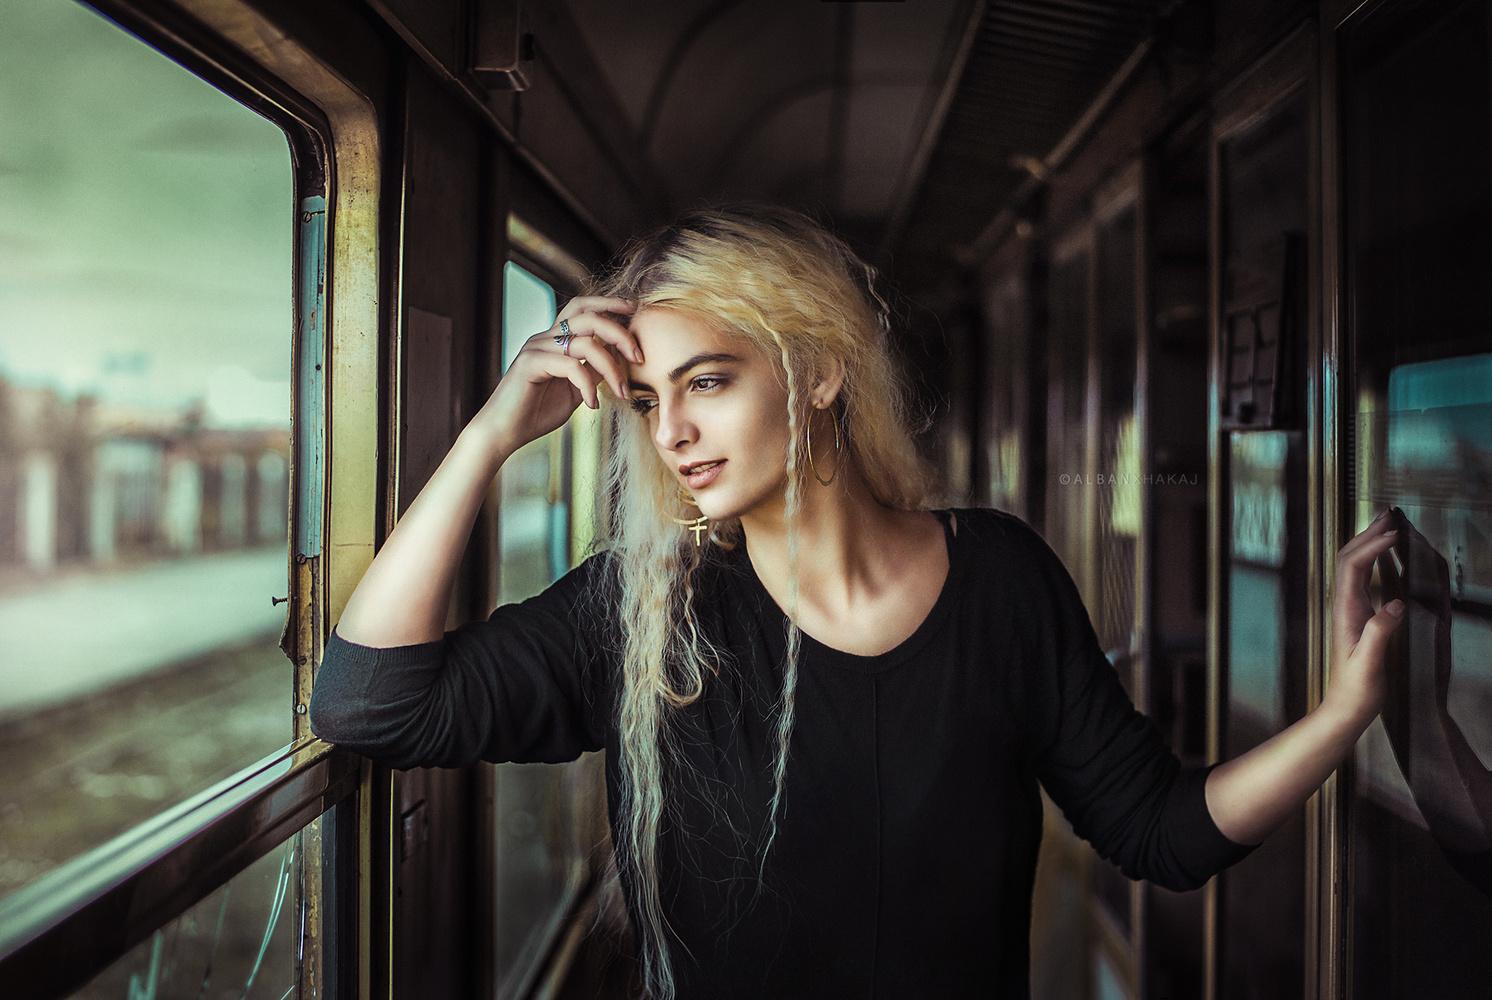 Ledia by Alban Xhakaj